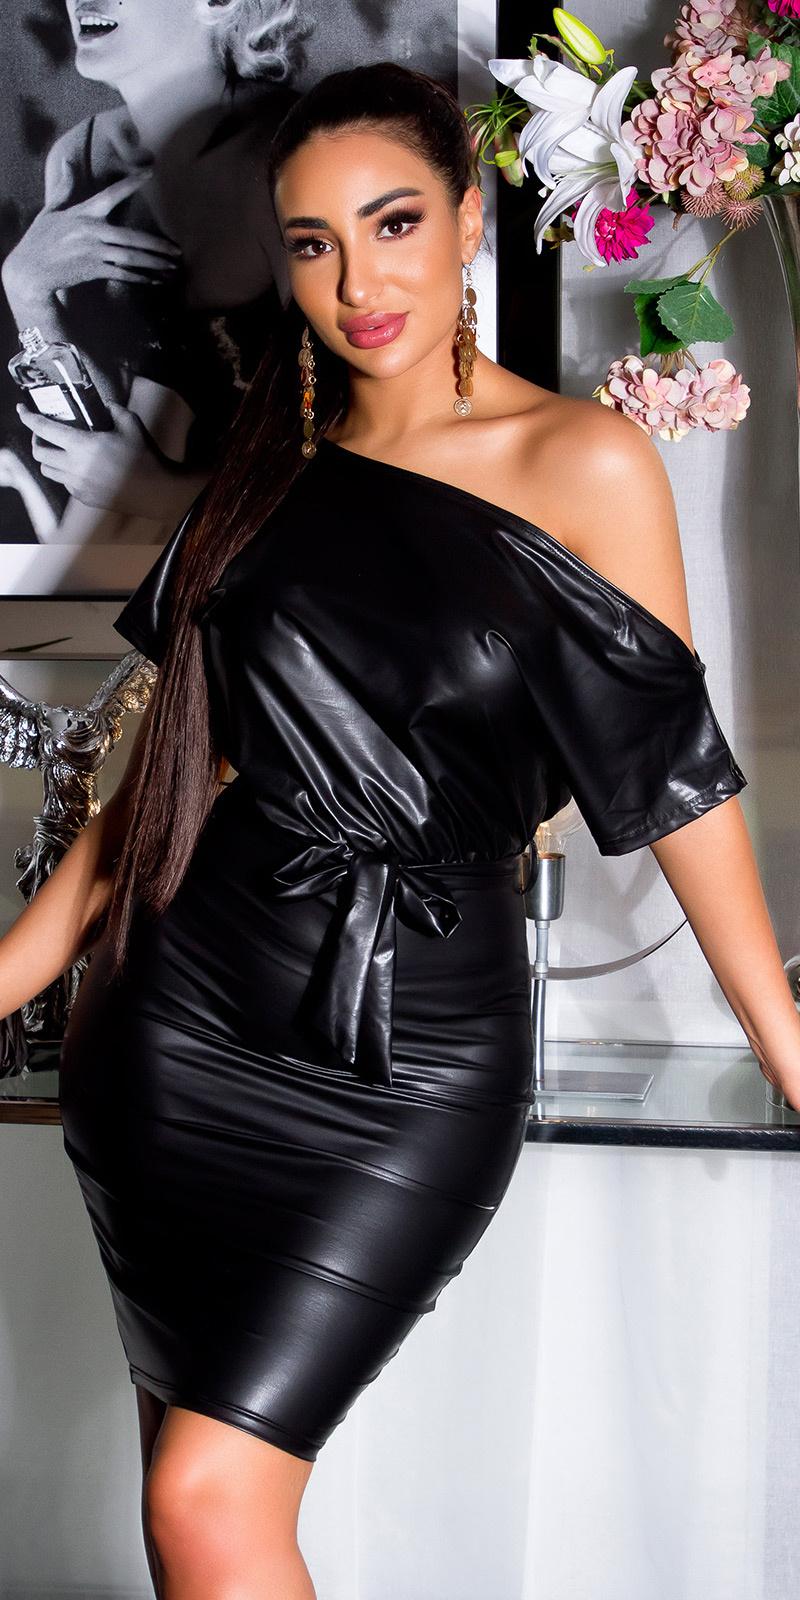 Sexy leder look minijurkje met riem zwart